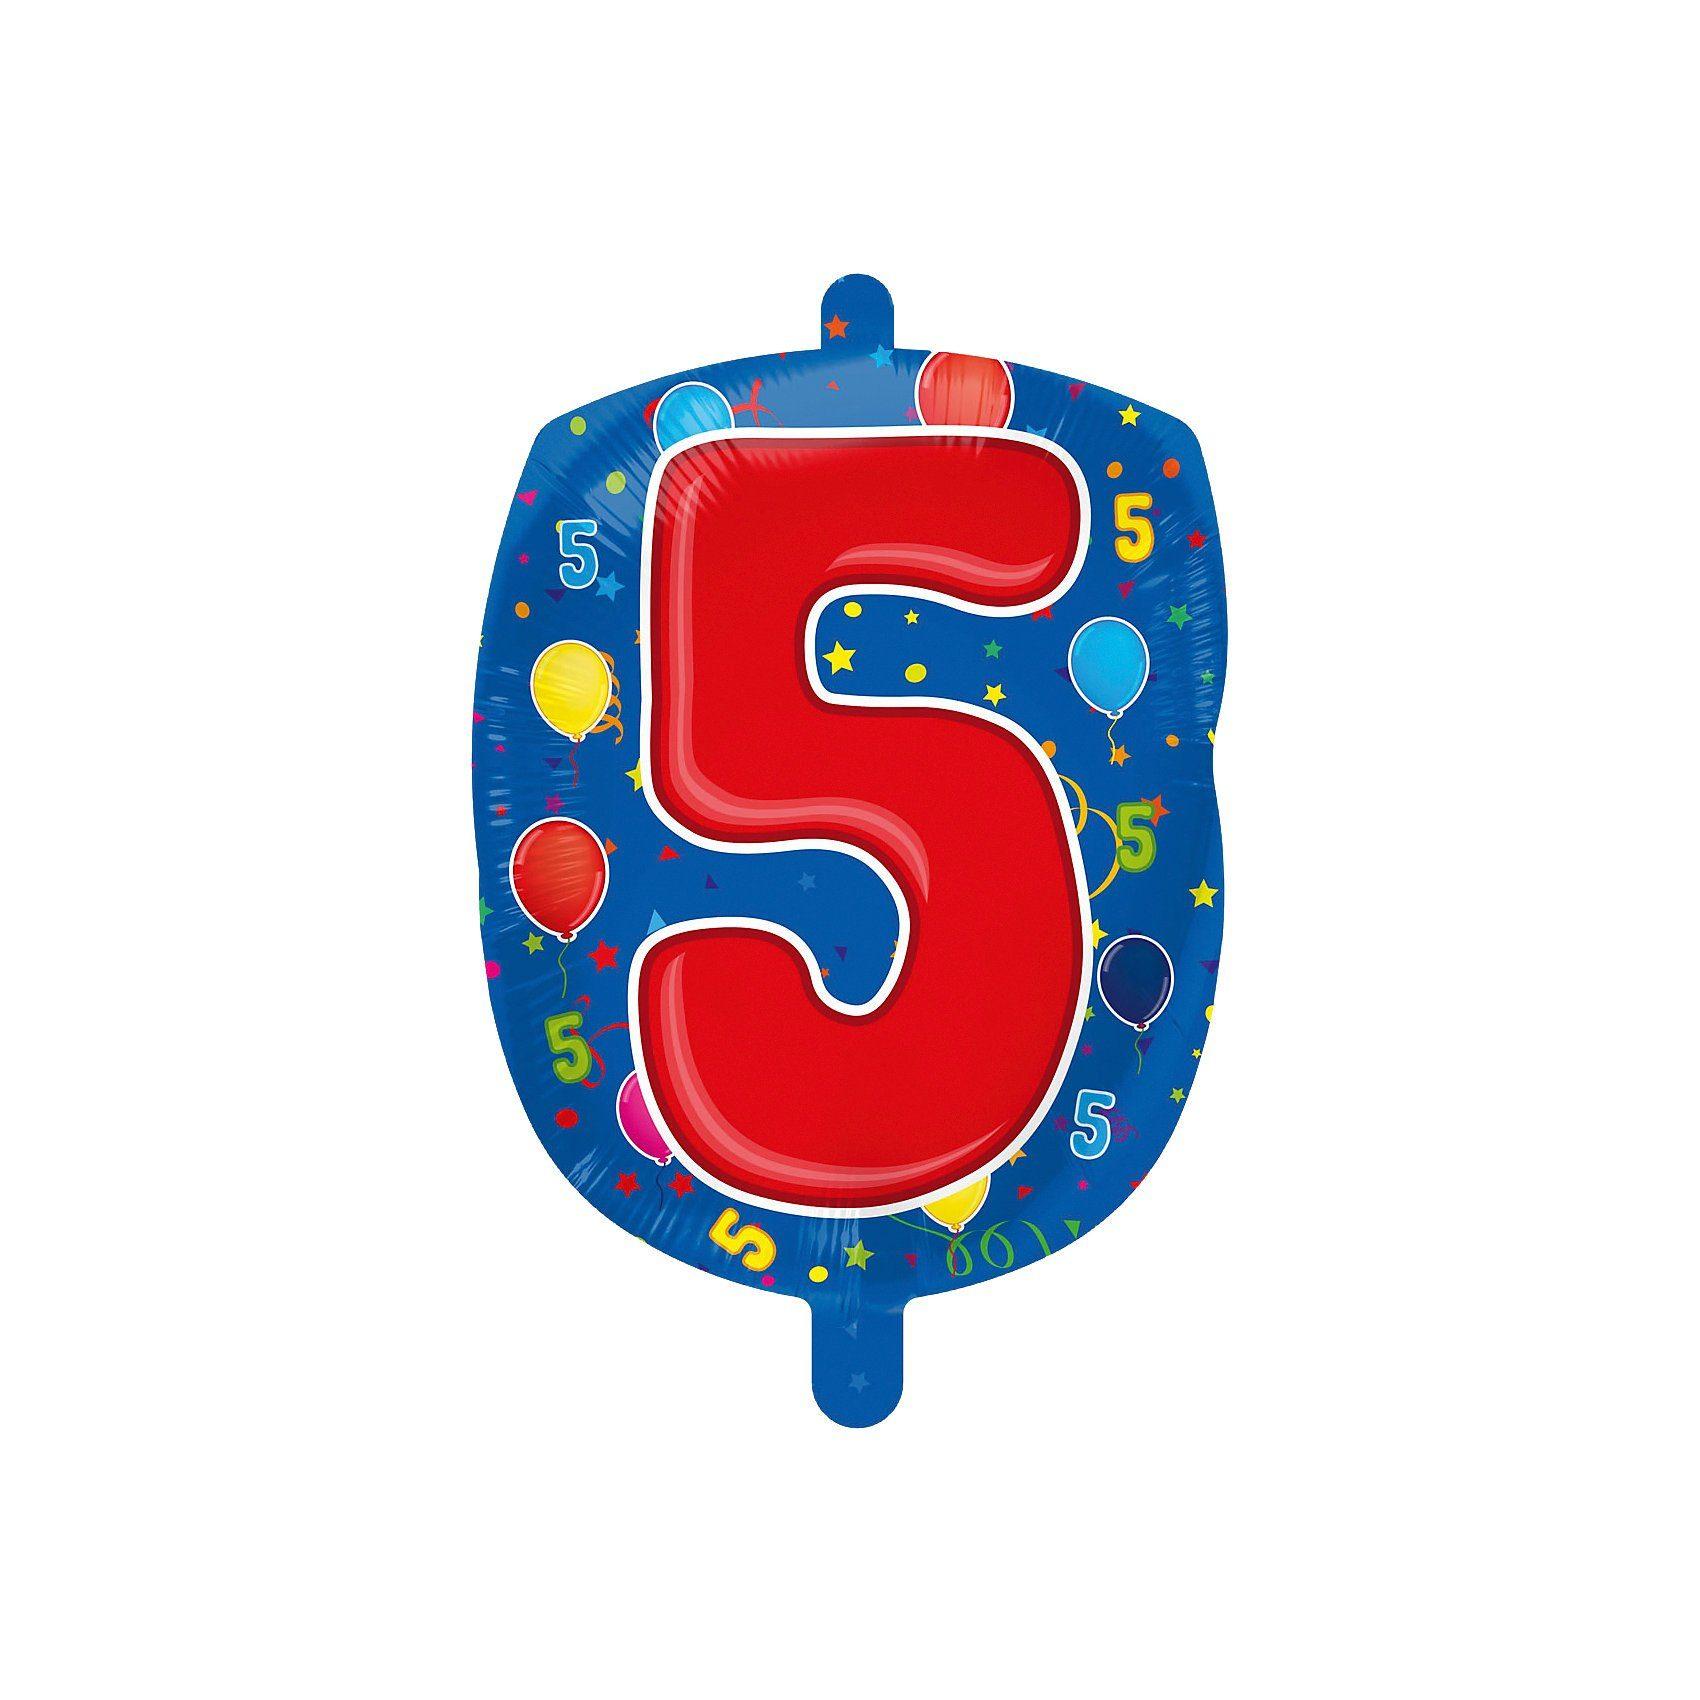 Folienballon Zahl 5